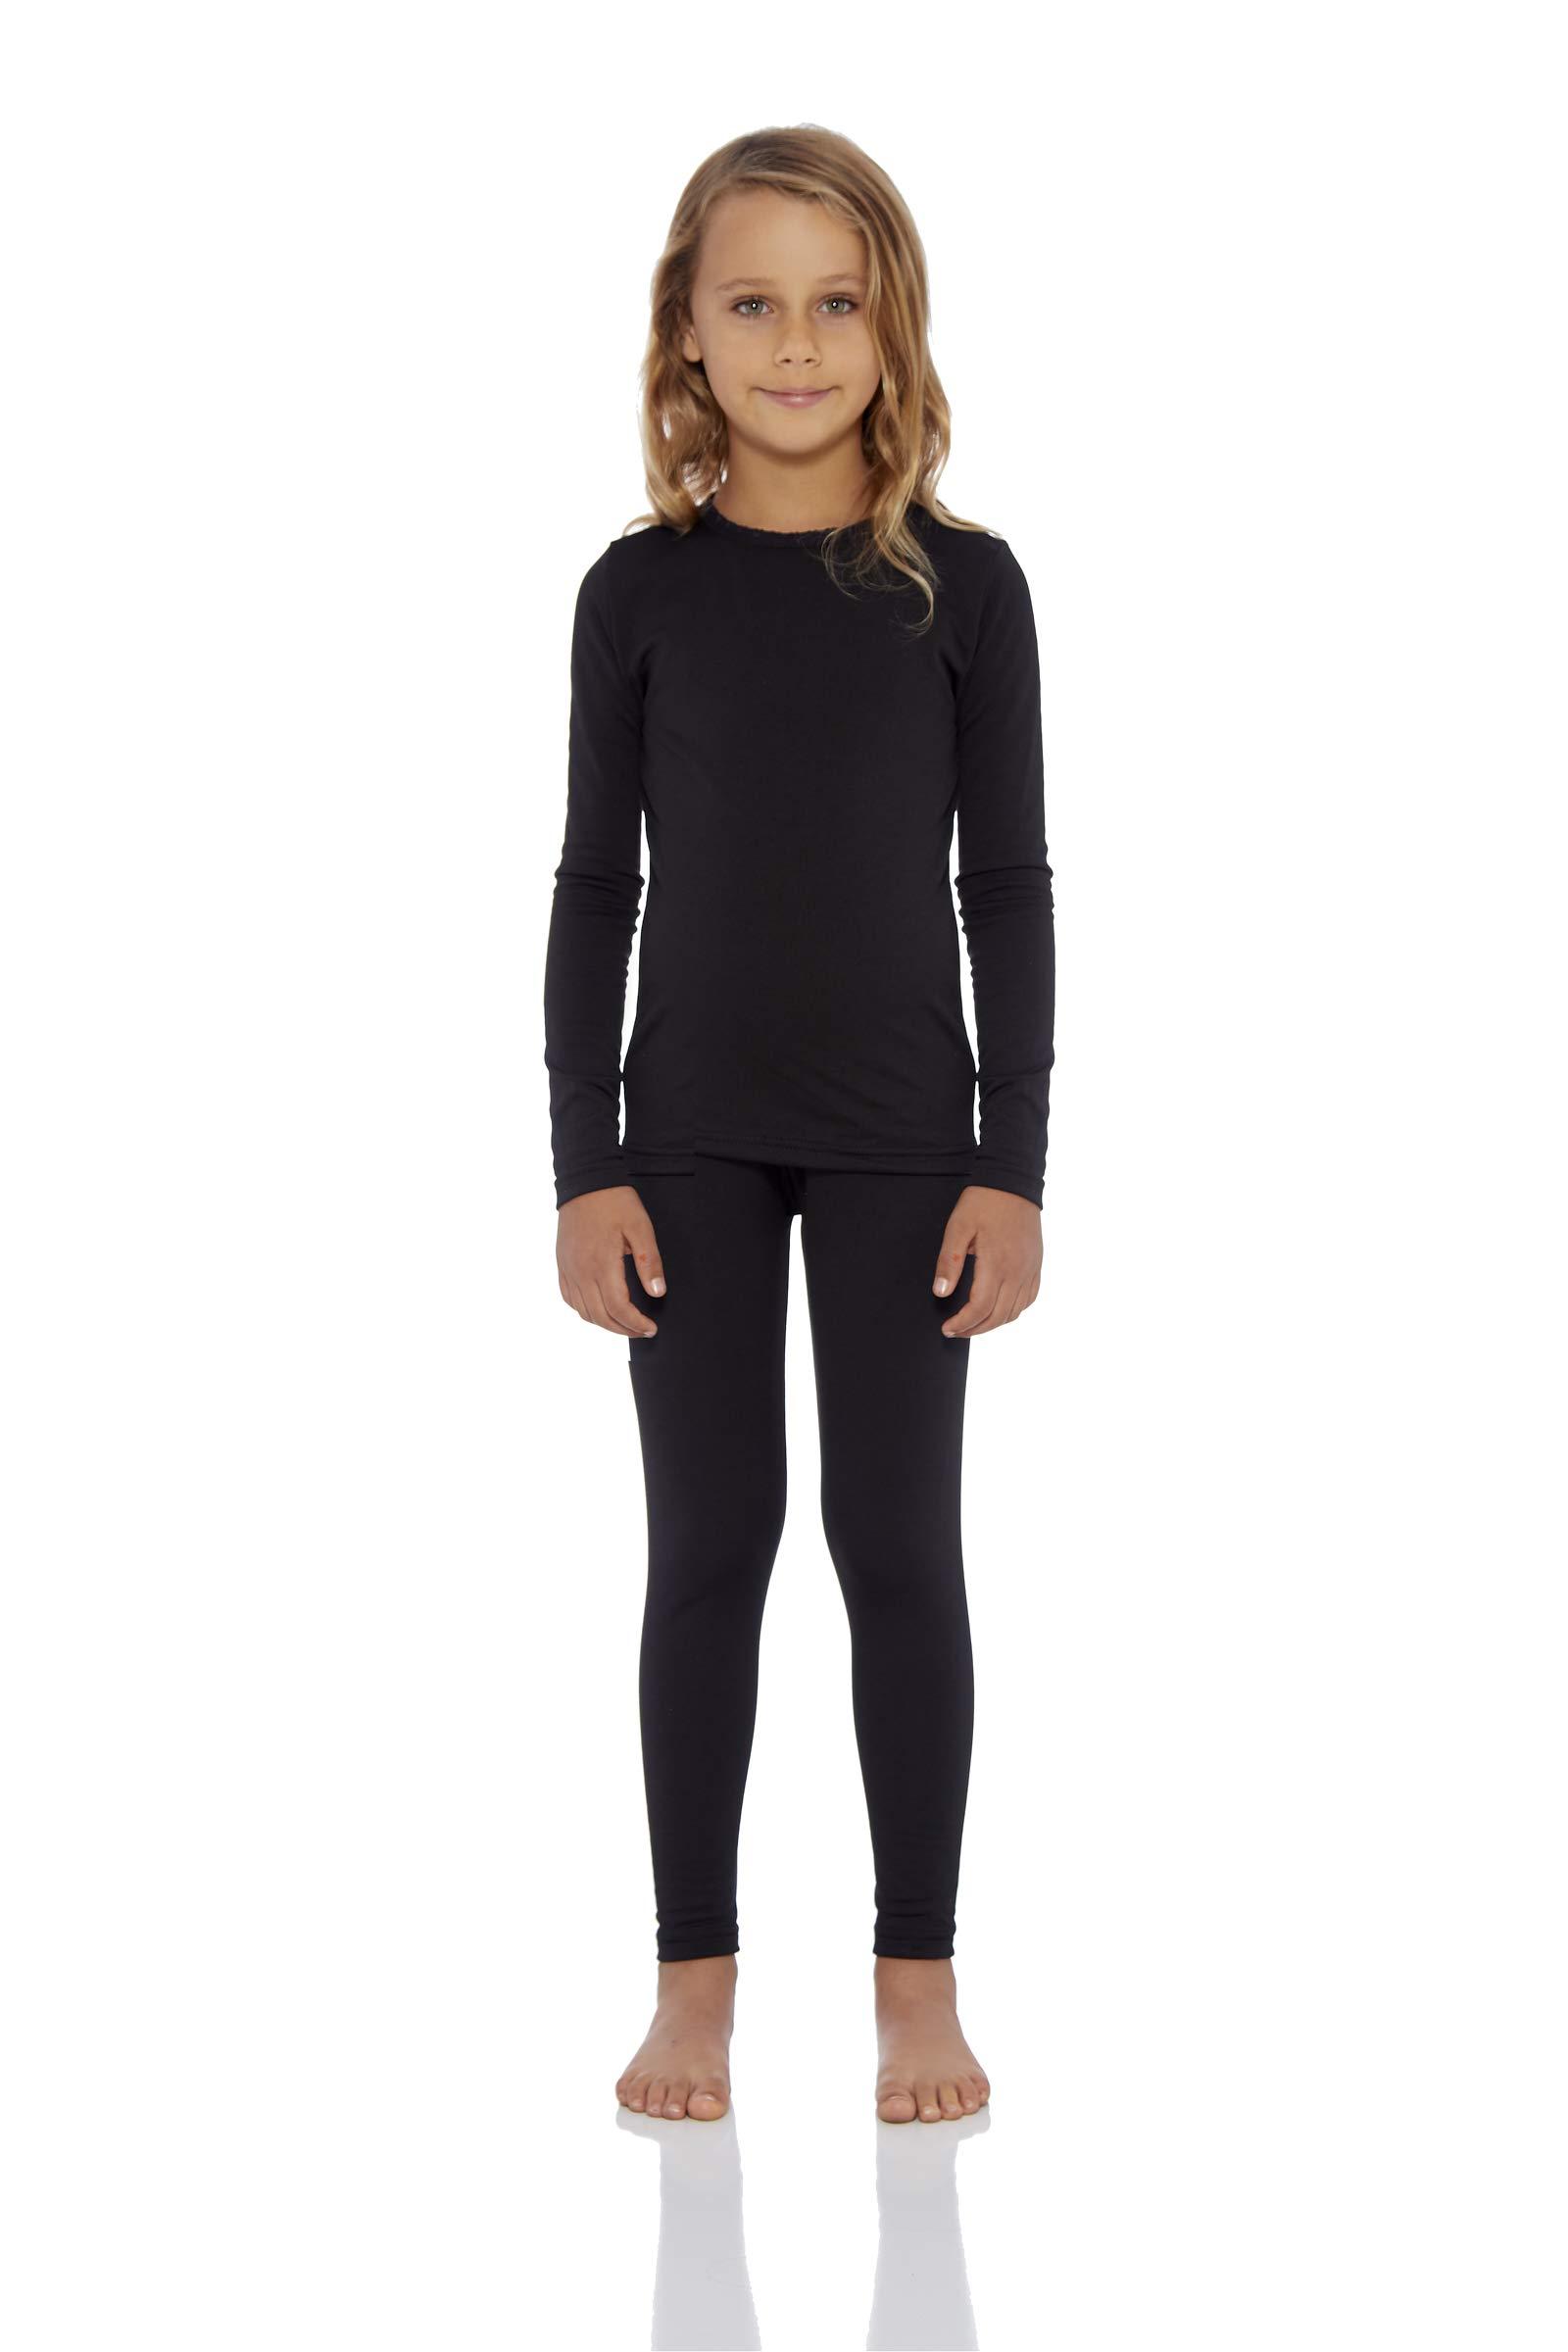 Rocky Girl's Smooth Knit Thermal Underwear 2PC Set Long John Top and Bottom Pajamas (Black, XXS) by Rocky